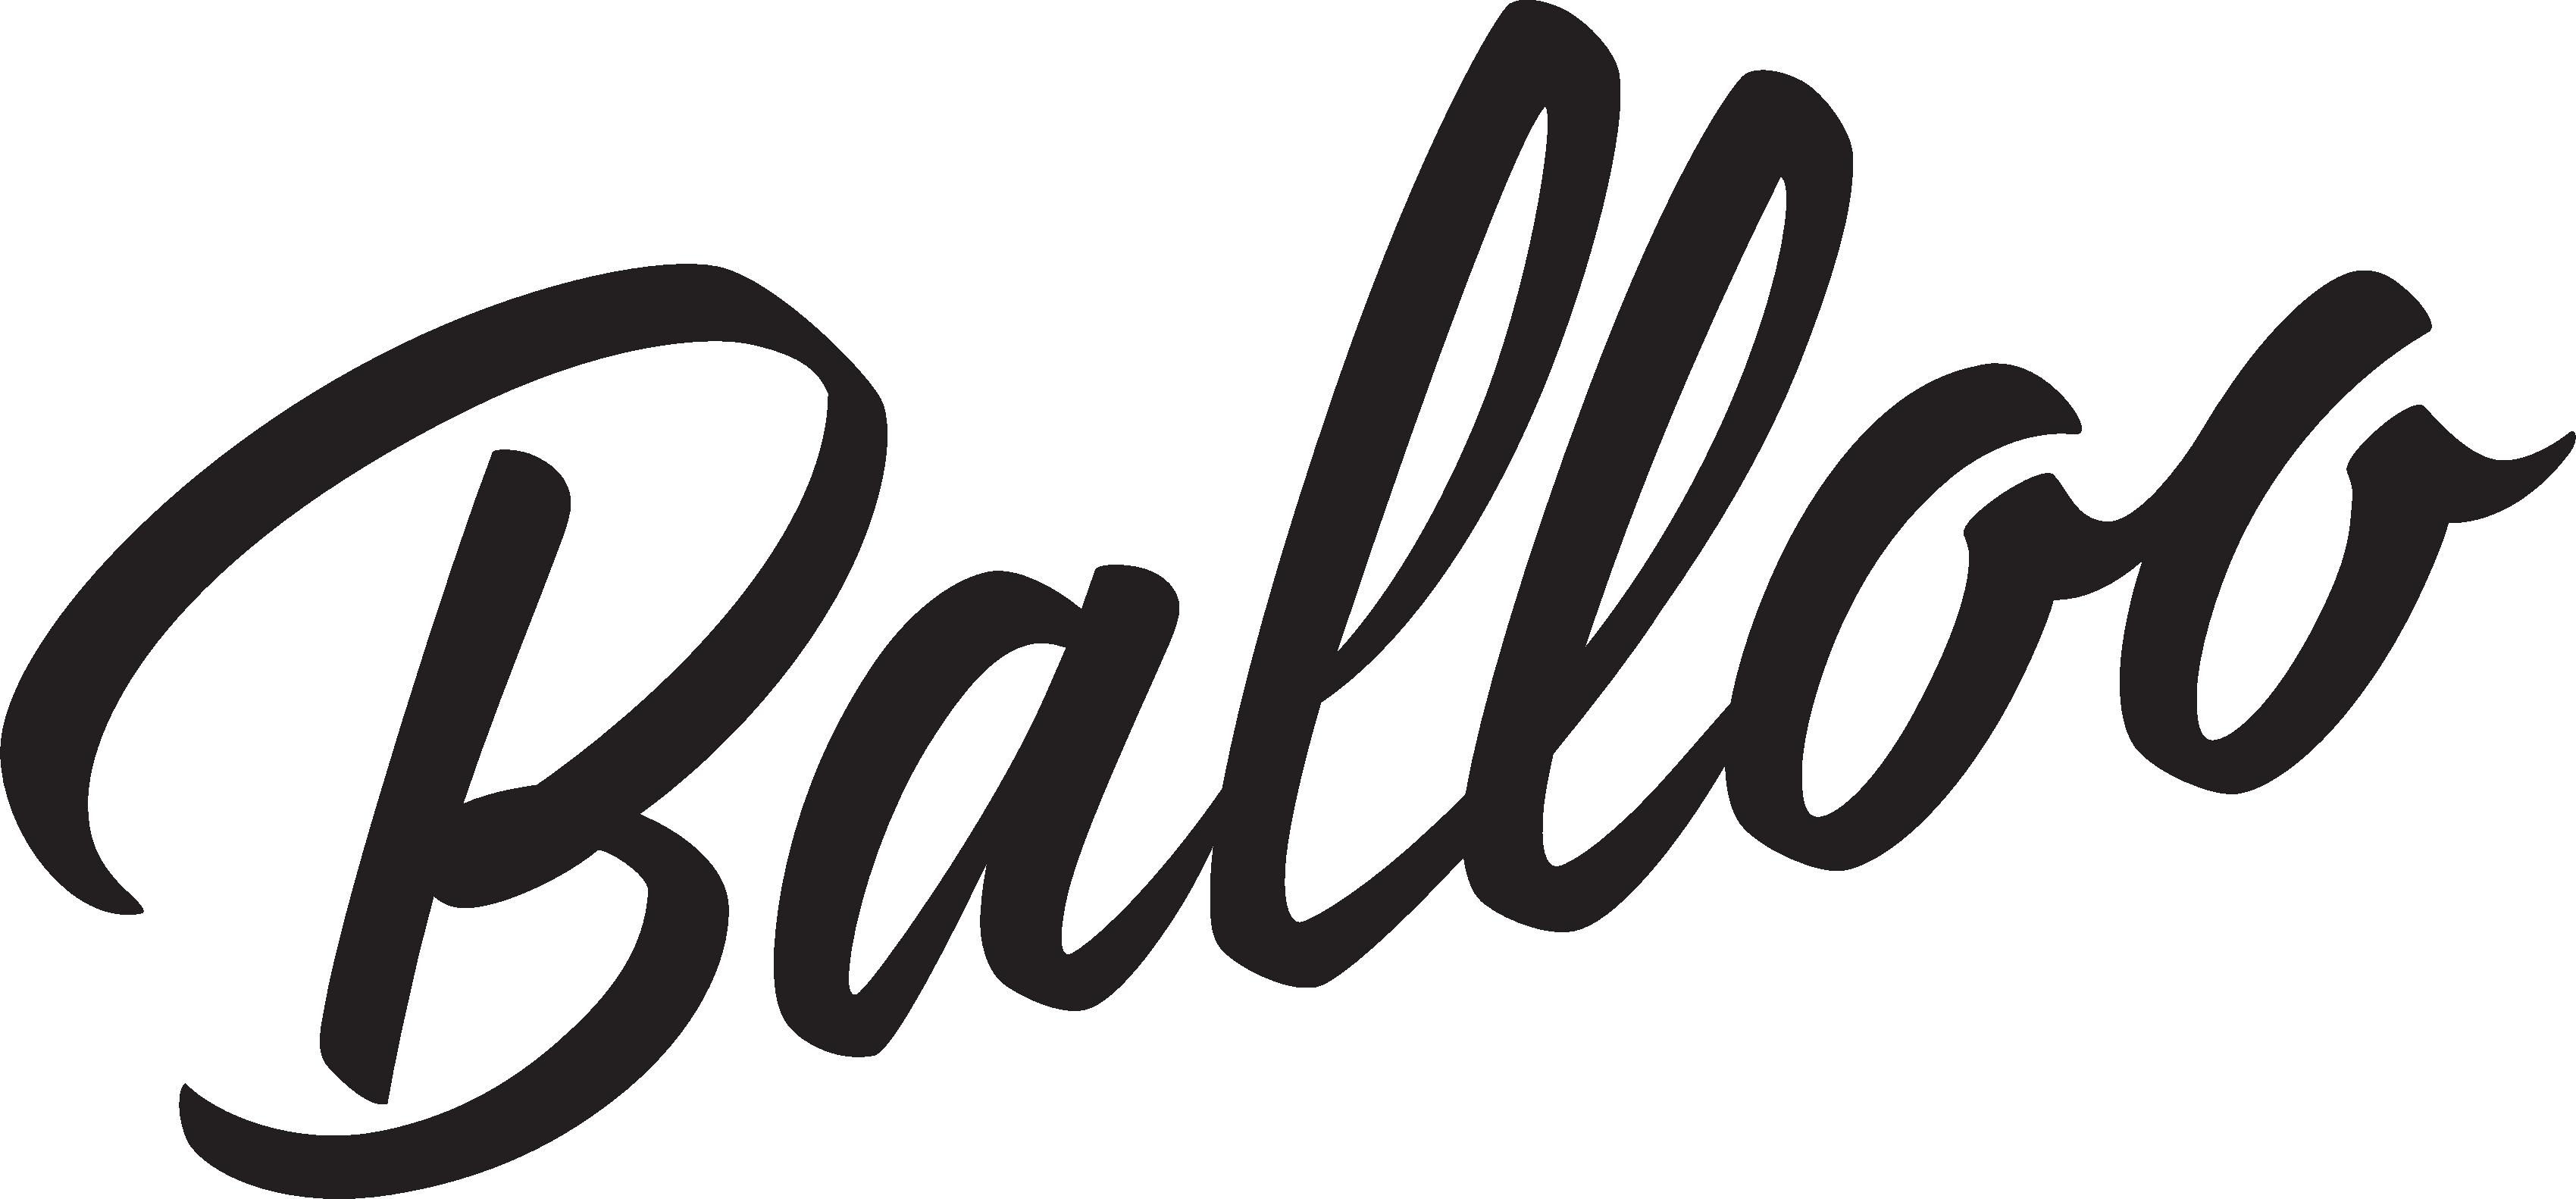 www.balloo.cz